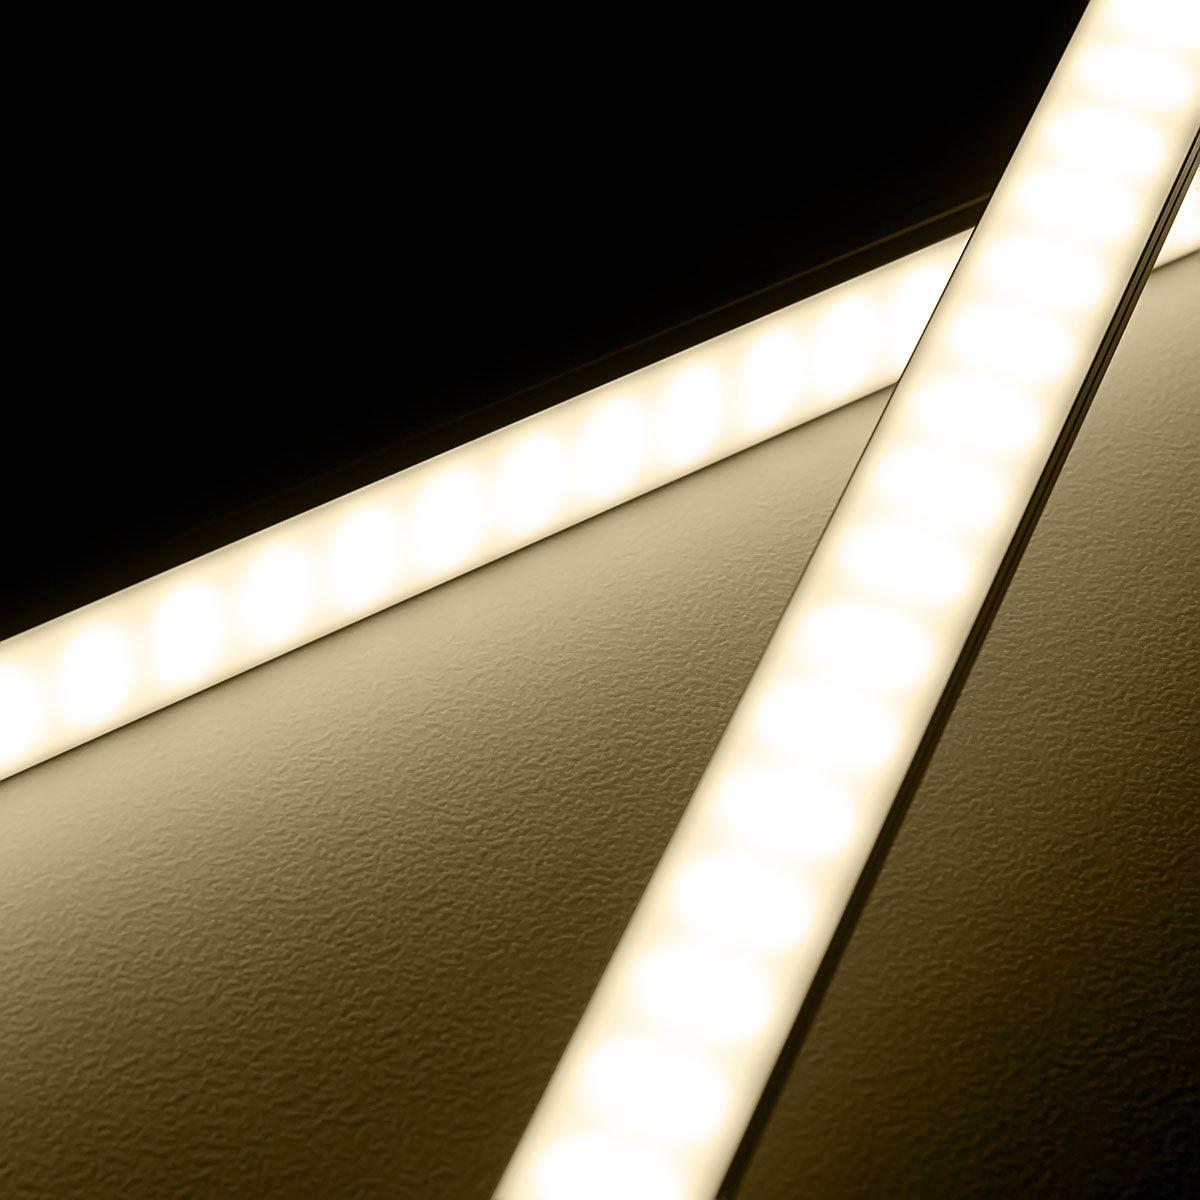 24V High-Power Aluminium LED Leiste – tageslichtweiß – diffuse Abdeckung